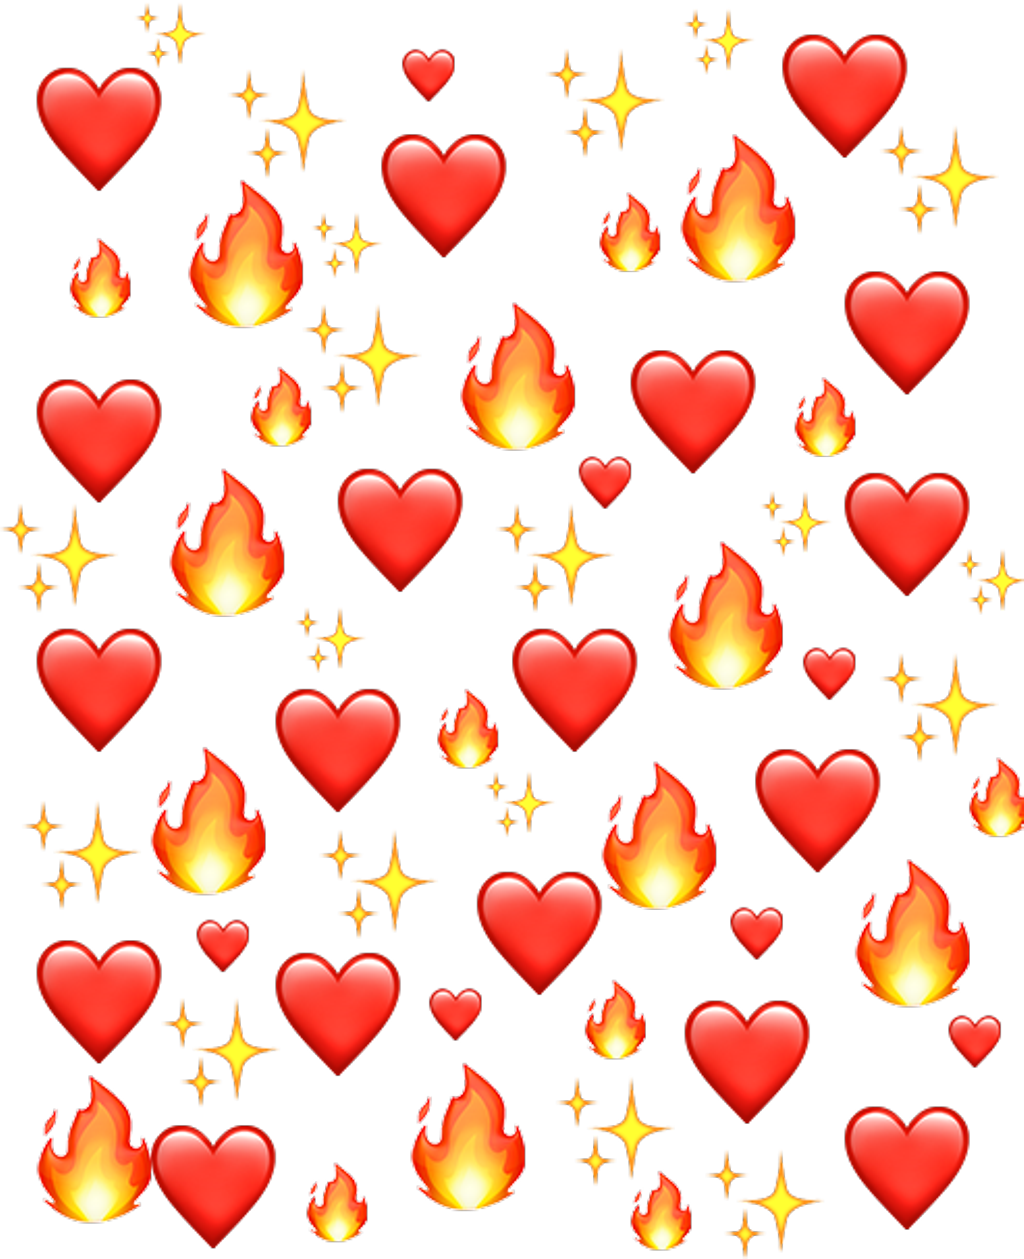 #emoji #emojis #emojiiphone #emojibackground #fire #fireemoji #heart #heartemoji #editoverlay